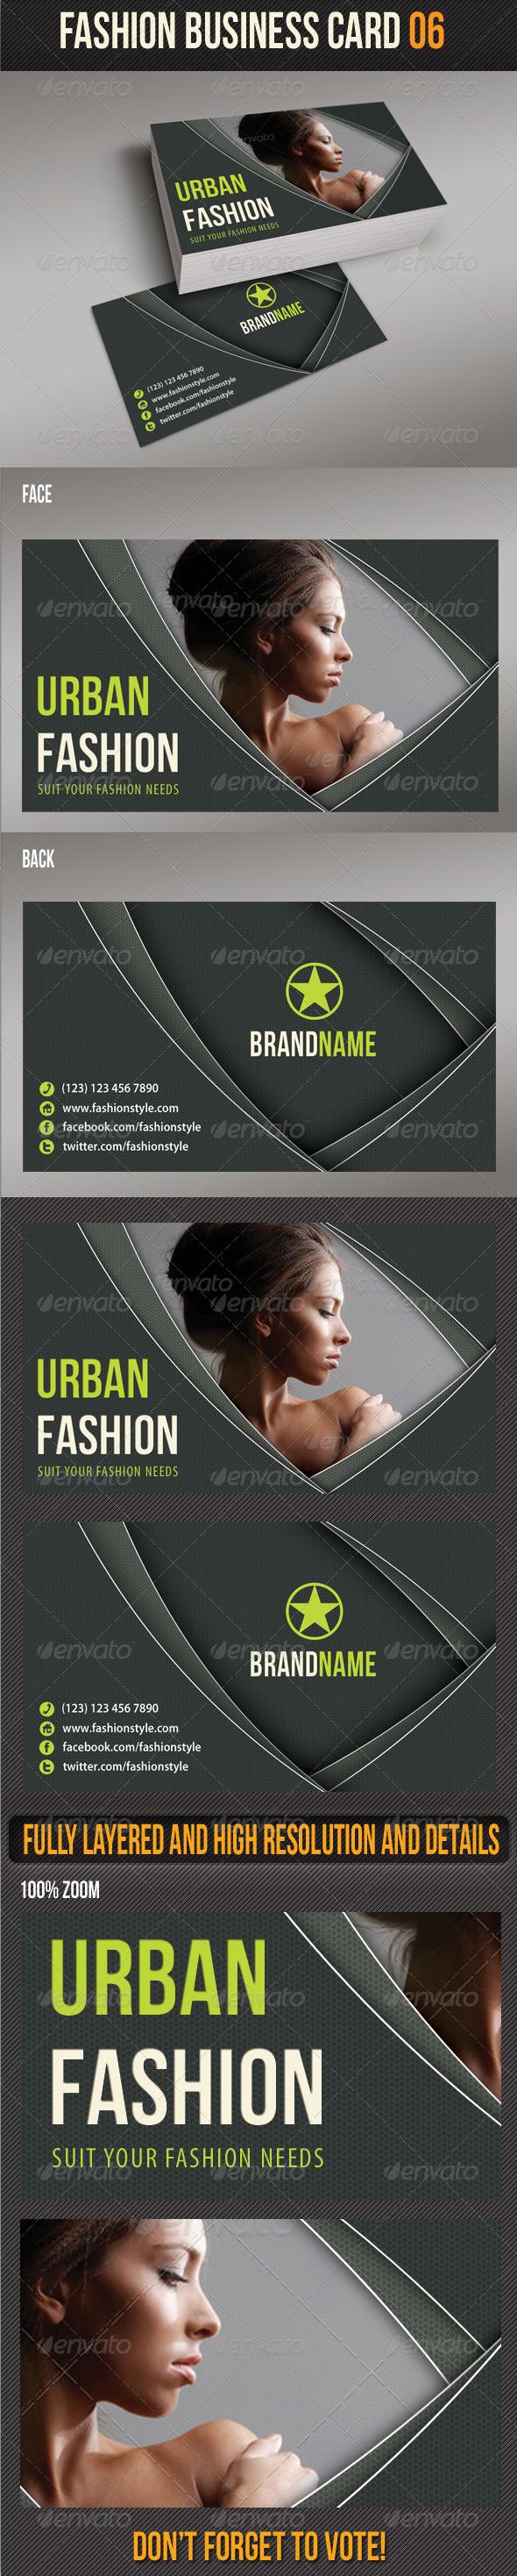 GraphicRiver Fashion Business Card 06 6693428